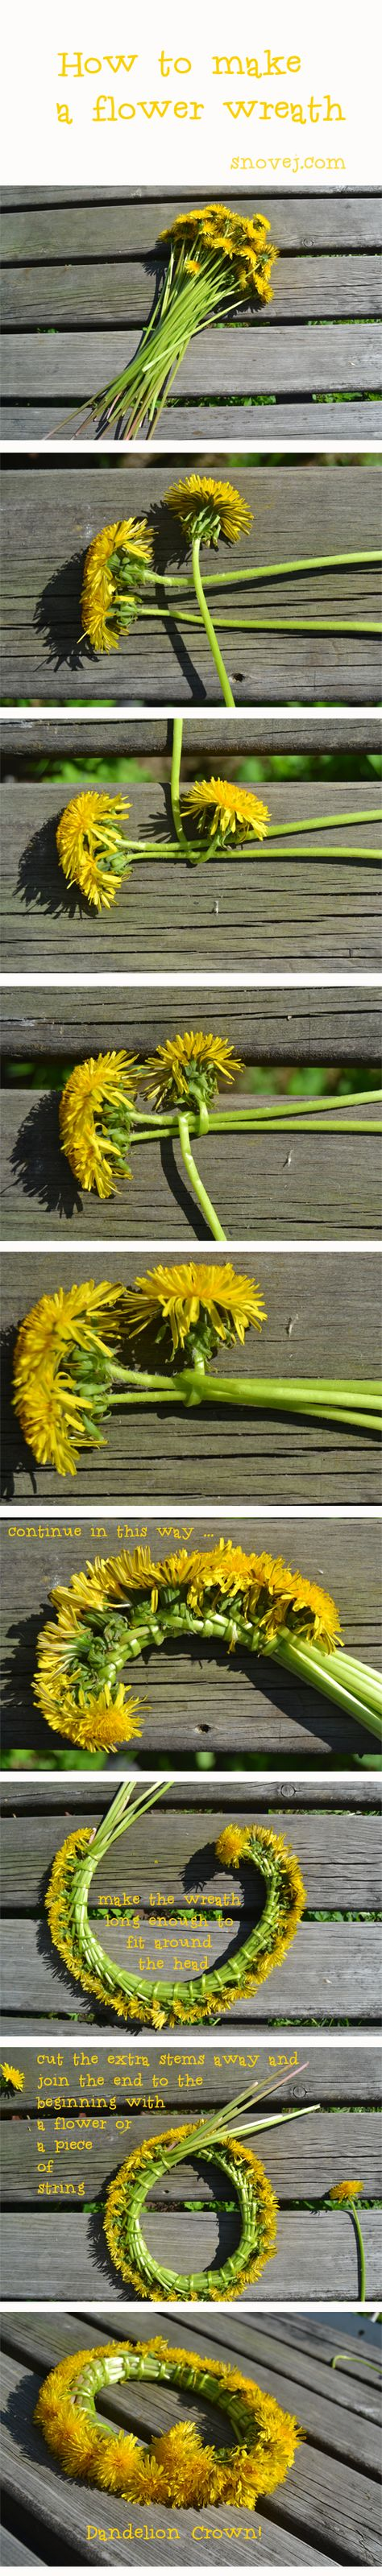 DIY Fresh Flower Heart Wreath is part of Diy flower crown - Diy Flower Crown, Flower Crowns, Diy Flowers, Diy Crafts Hacks, Cute Crafts, Diys, Fleurs Diy, Art Diy, Useful Life Hacks